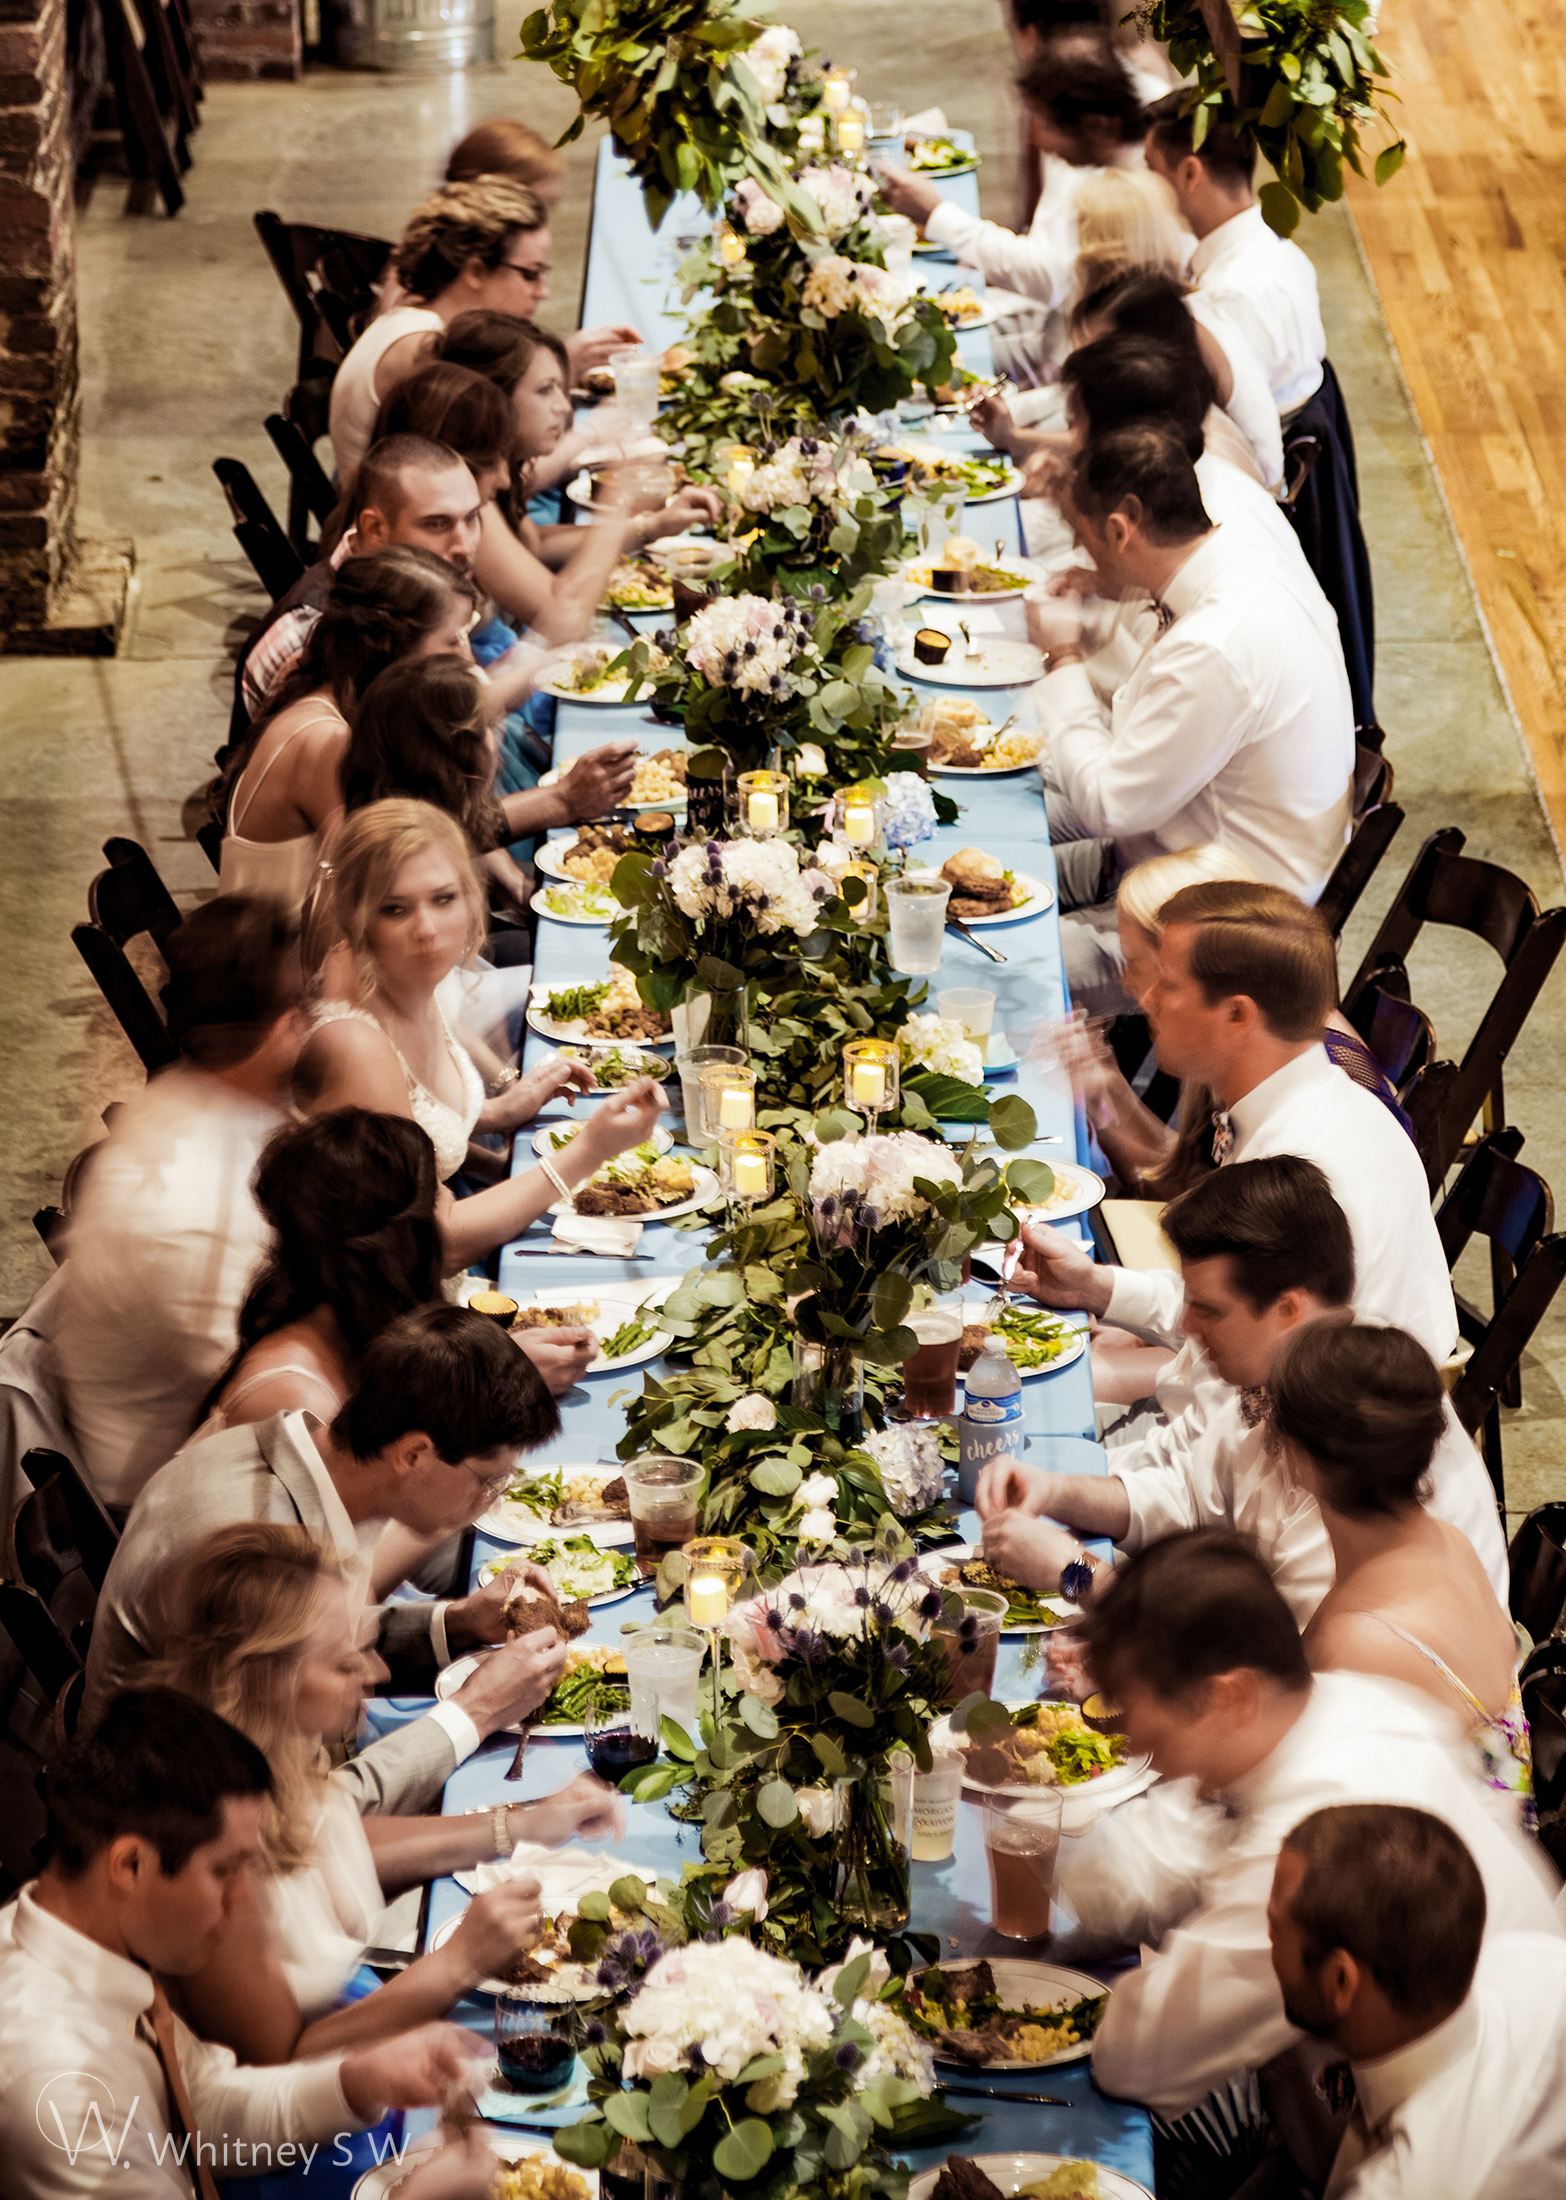 Morgan & Kaivon Wedding - Photography by Whitney S Williams whitneysw (46).jpg